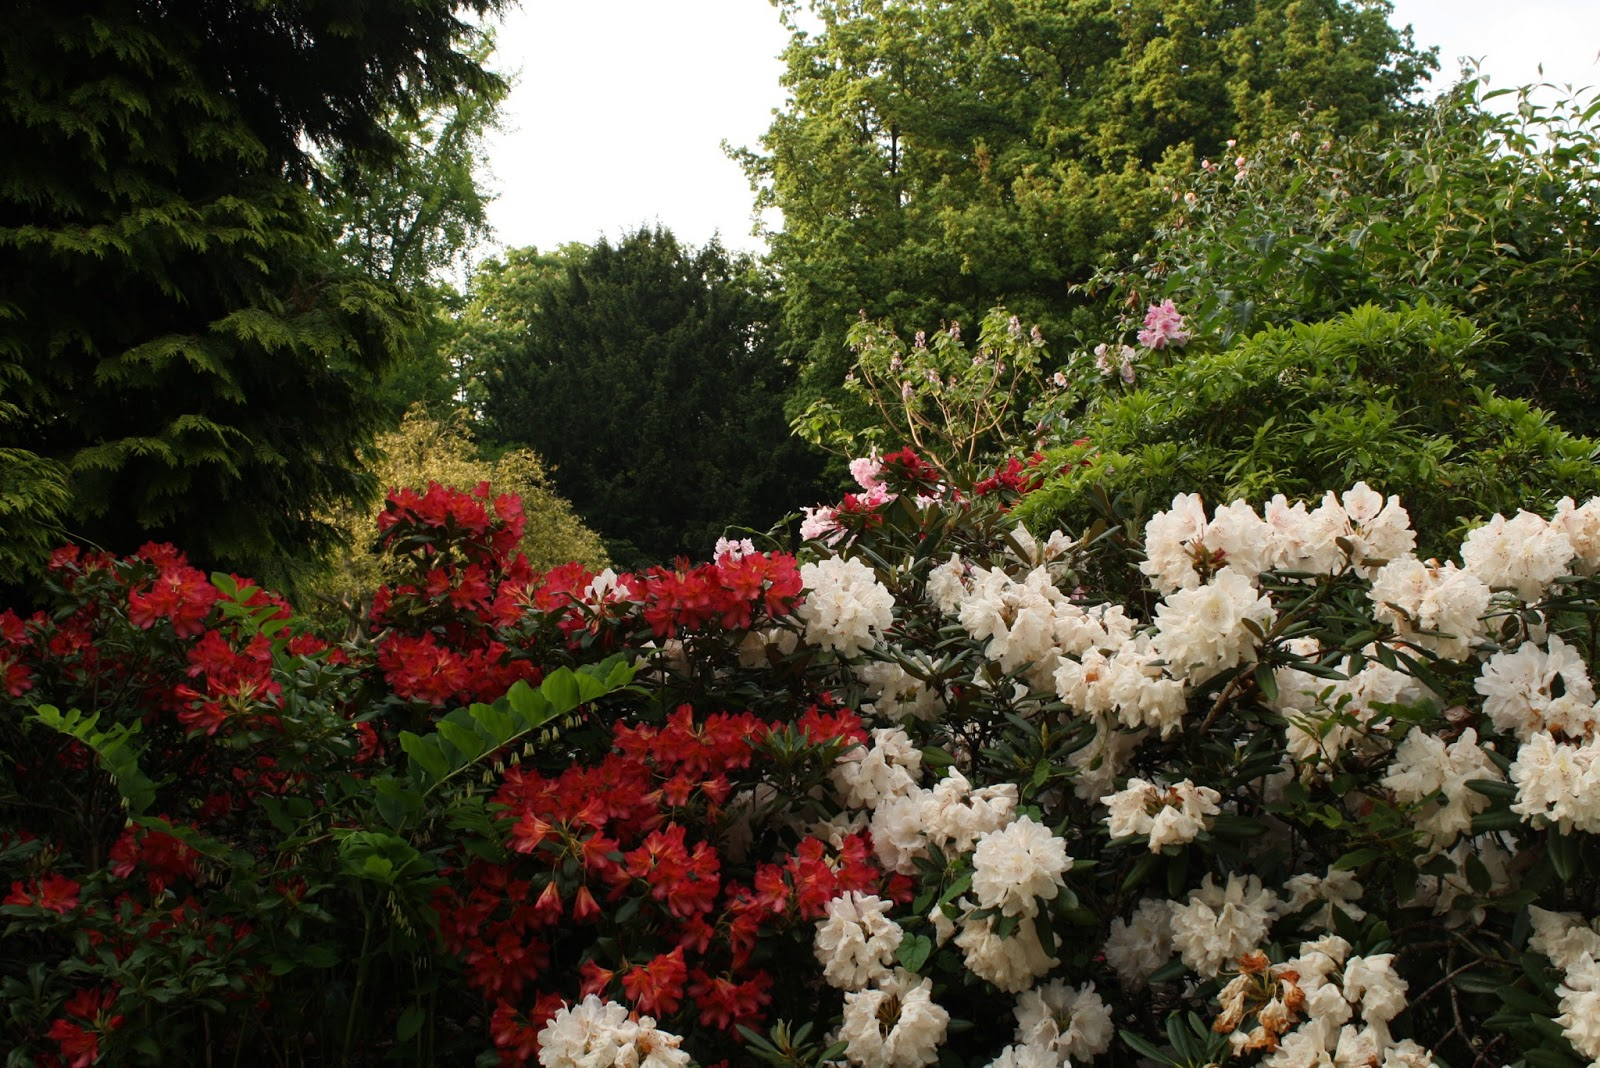 Garden Walk London: File:Kensington Gardens (The Flower Walk), London.JPG